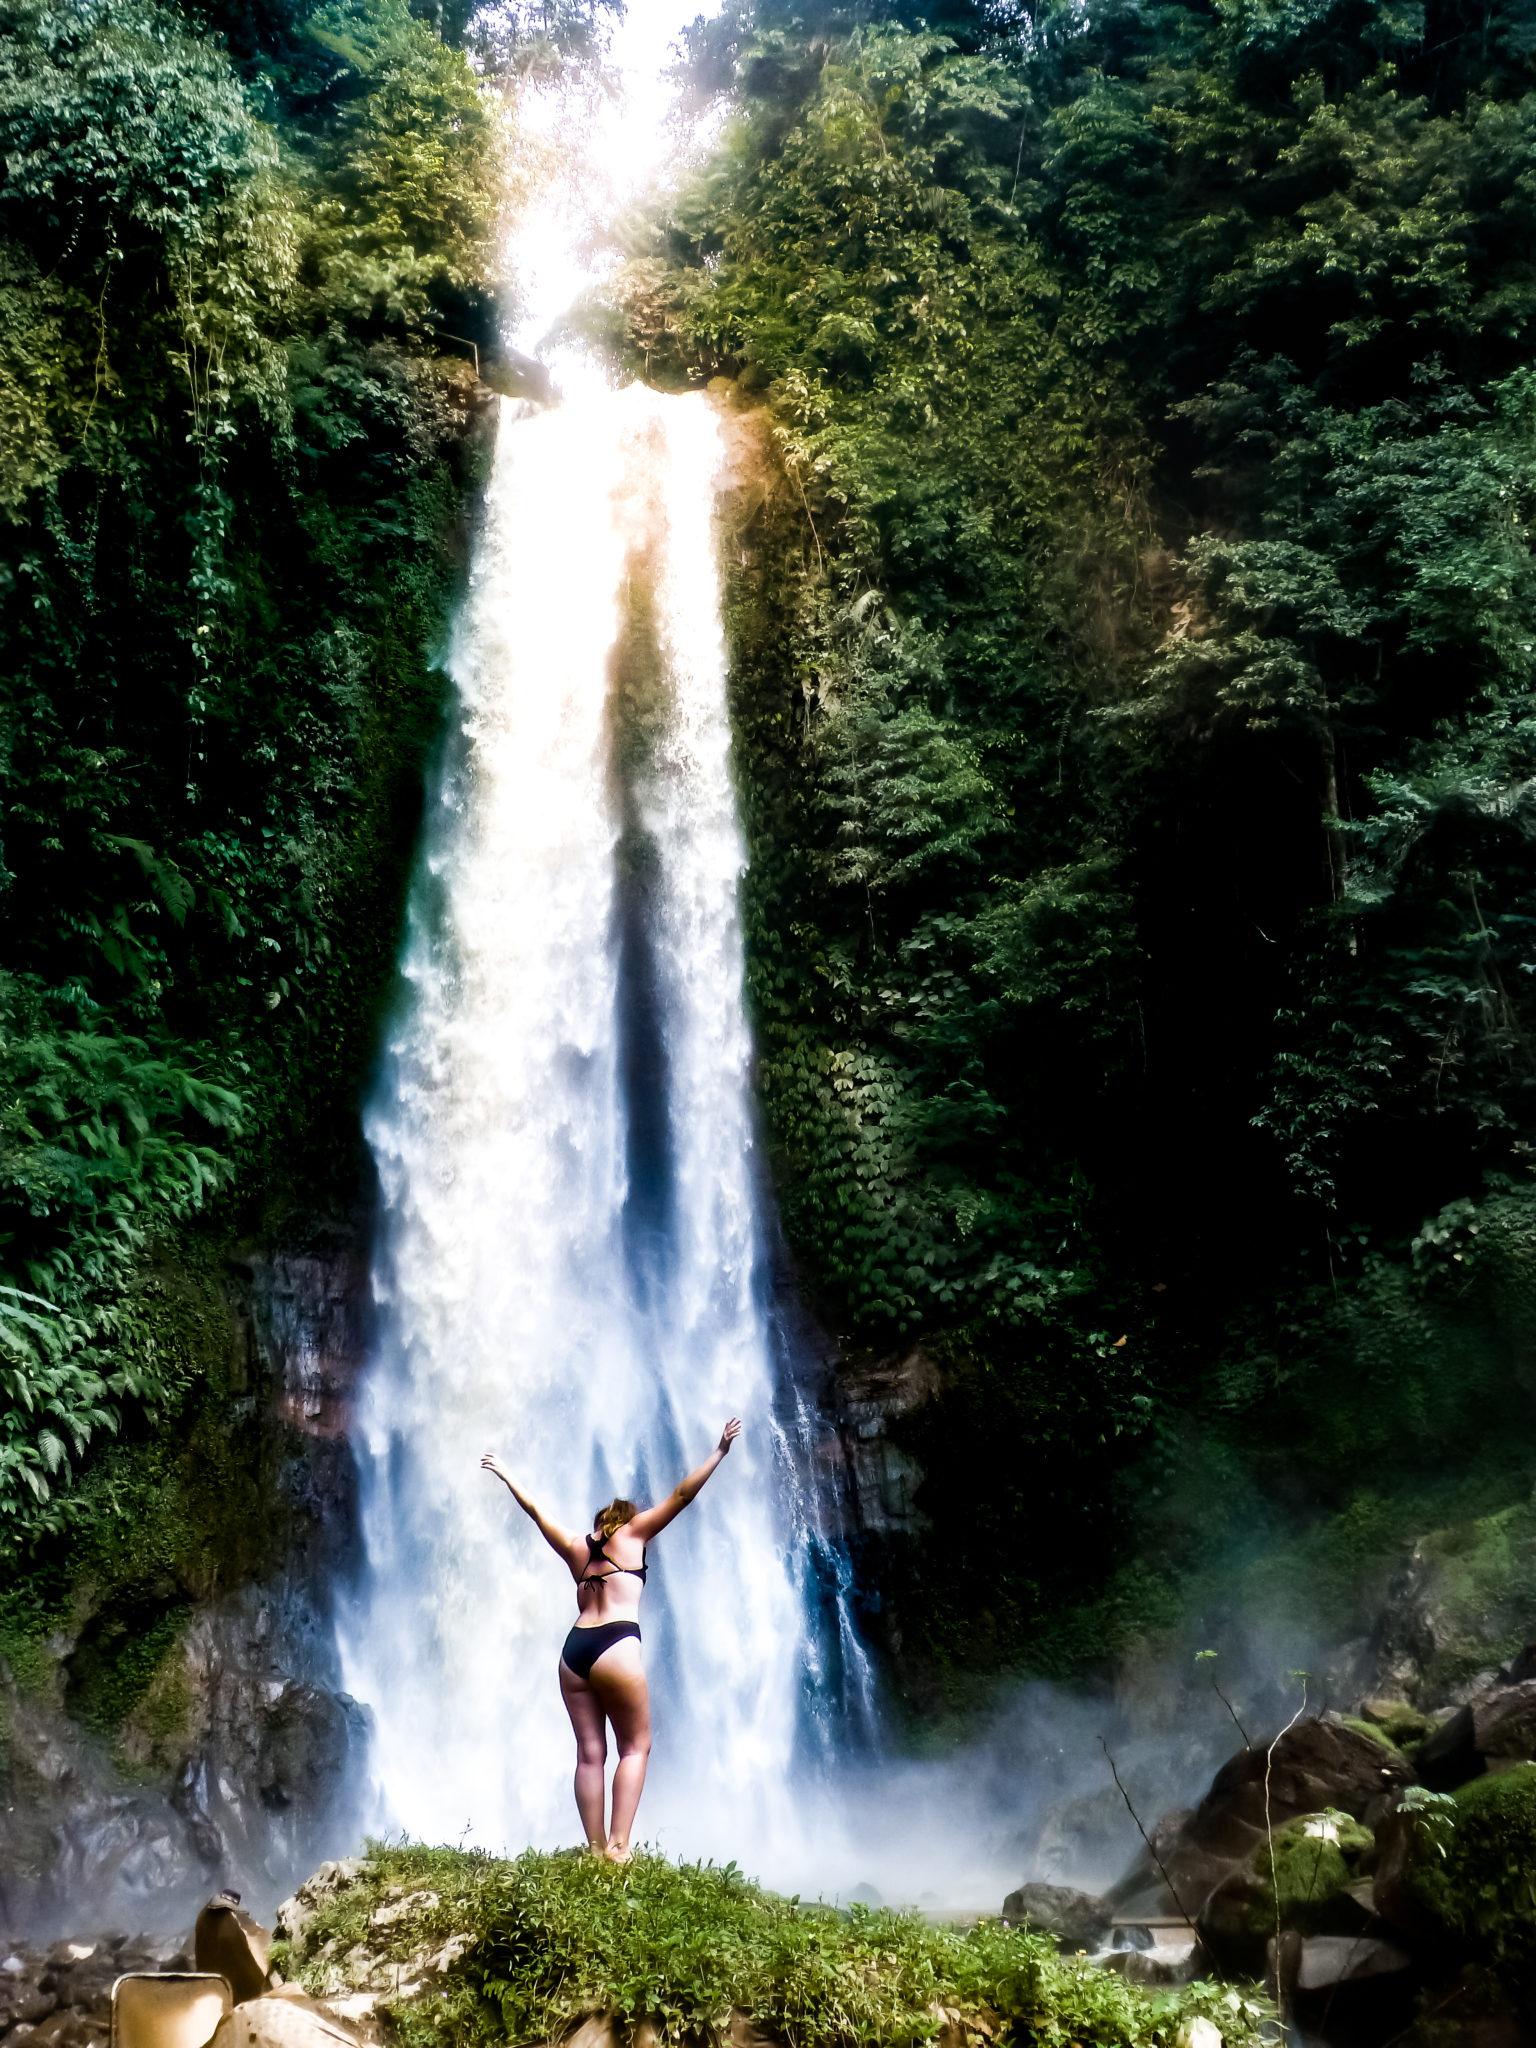 GitGit waterfall: Bali travel route